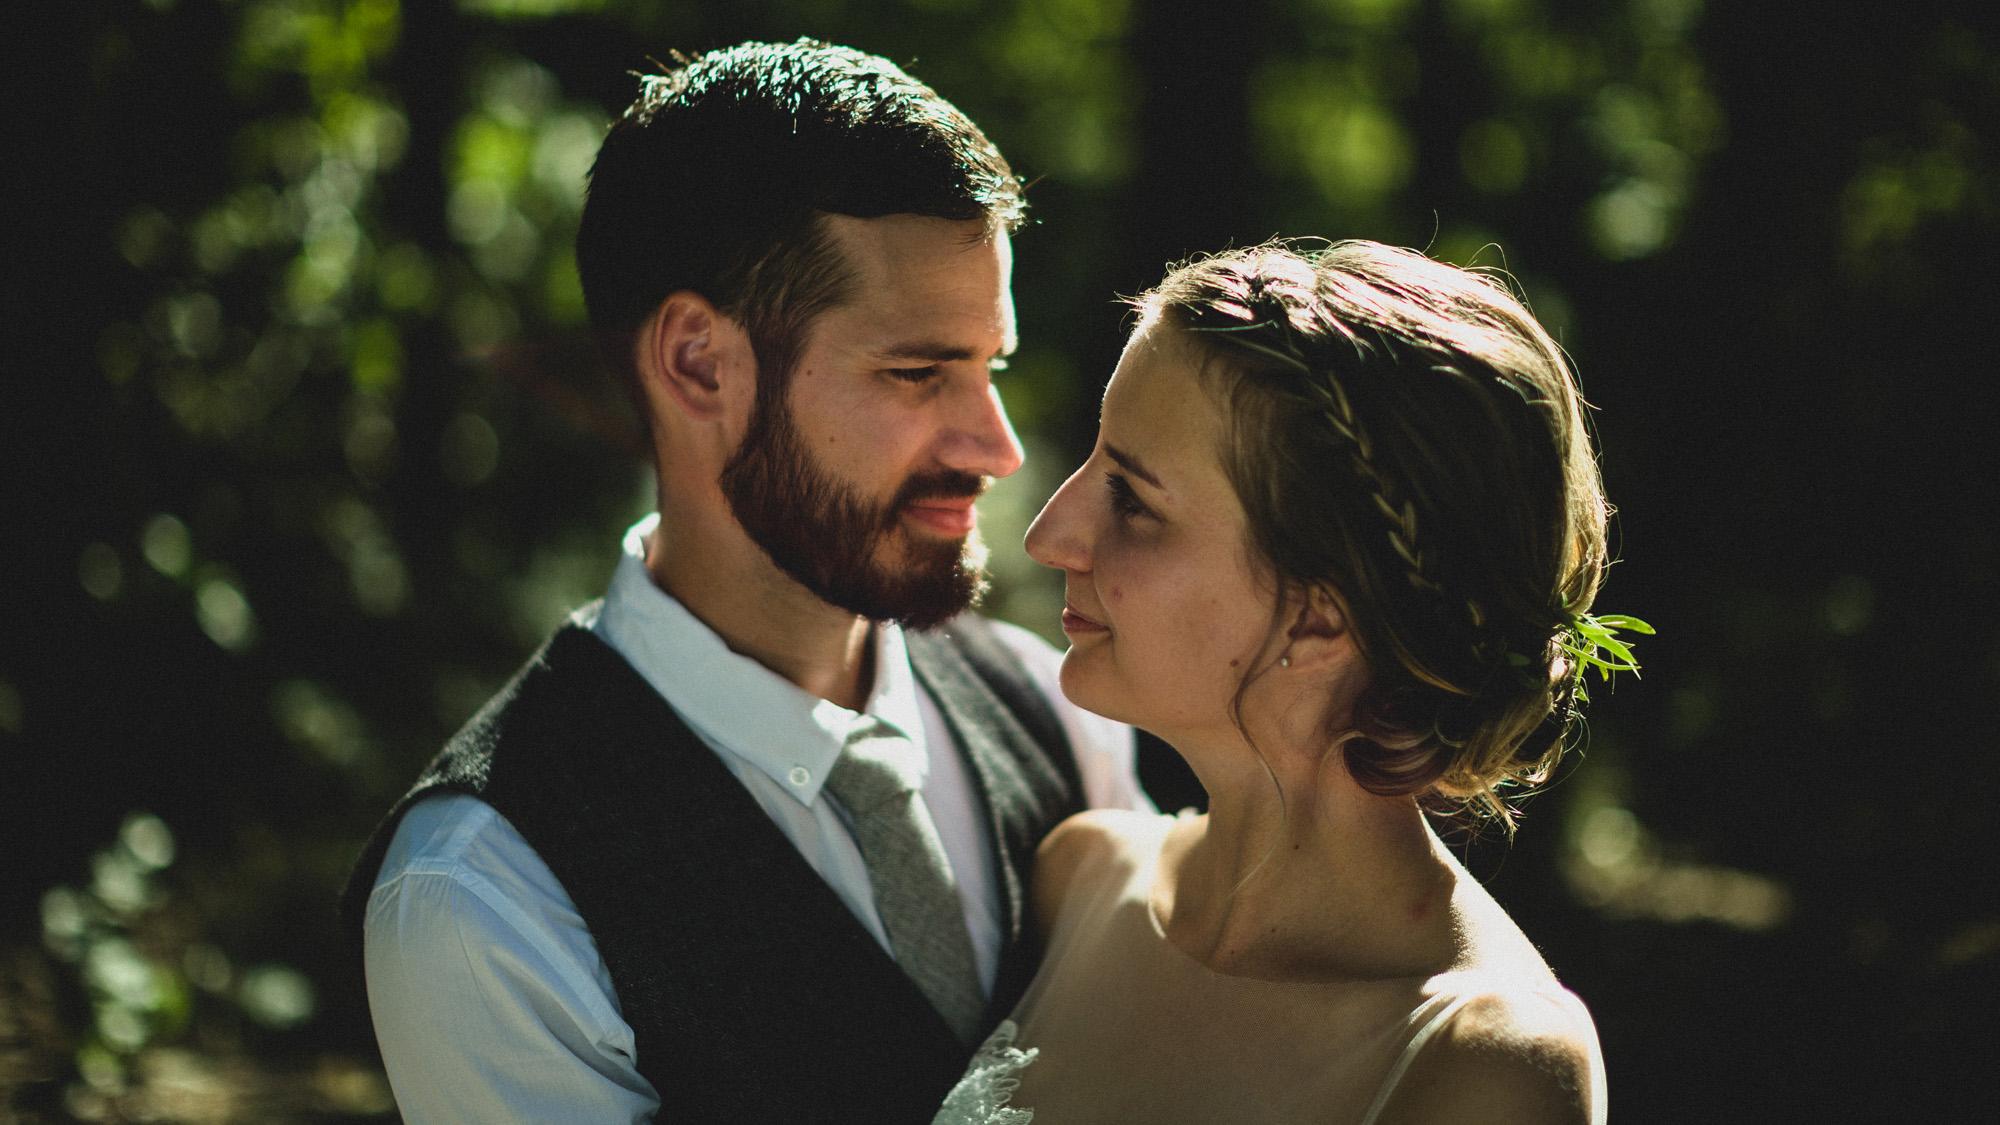 alec_vanderboom_springfield_missouri_wedding-0049.jpg